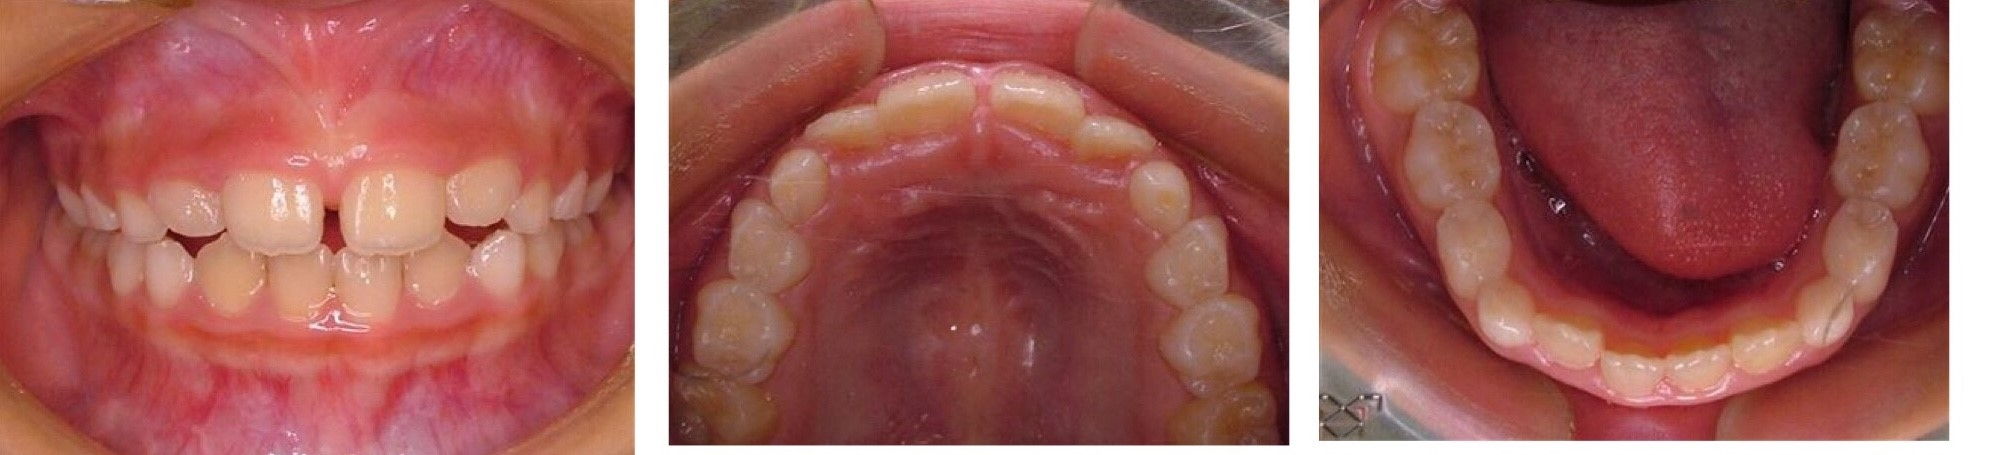 歯 っ 乳歯 すき